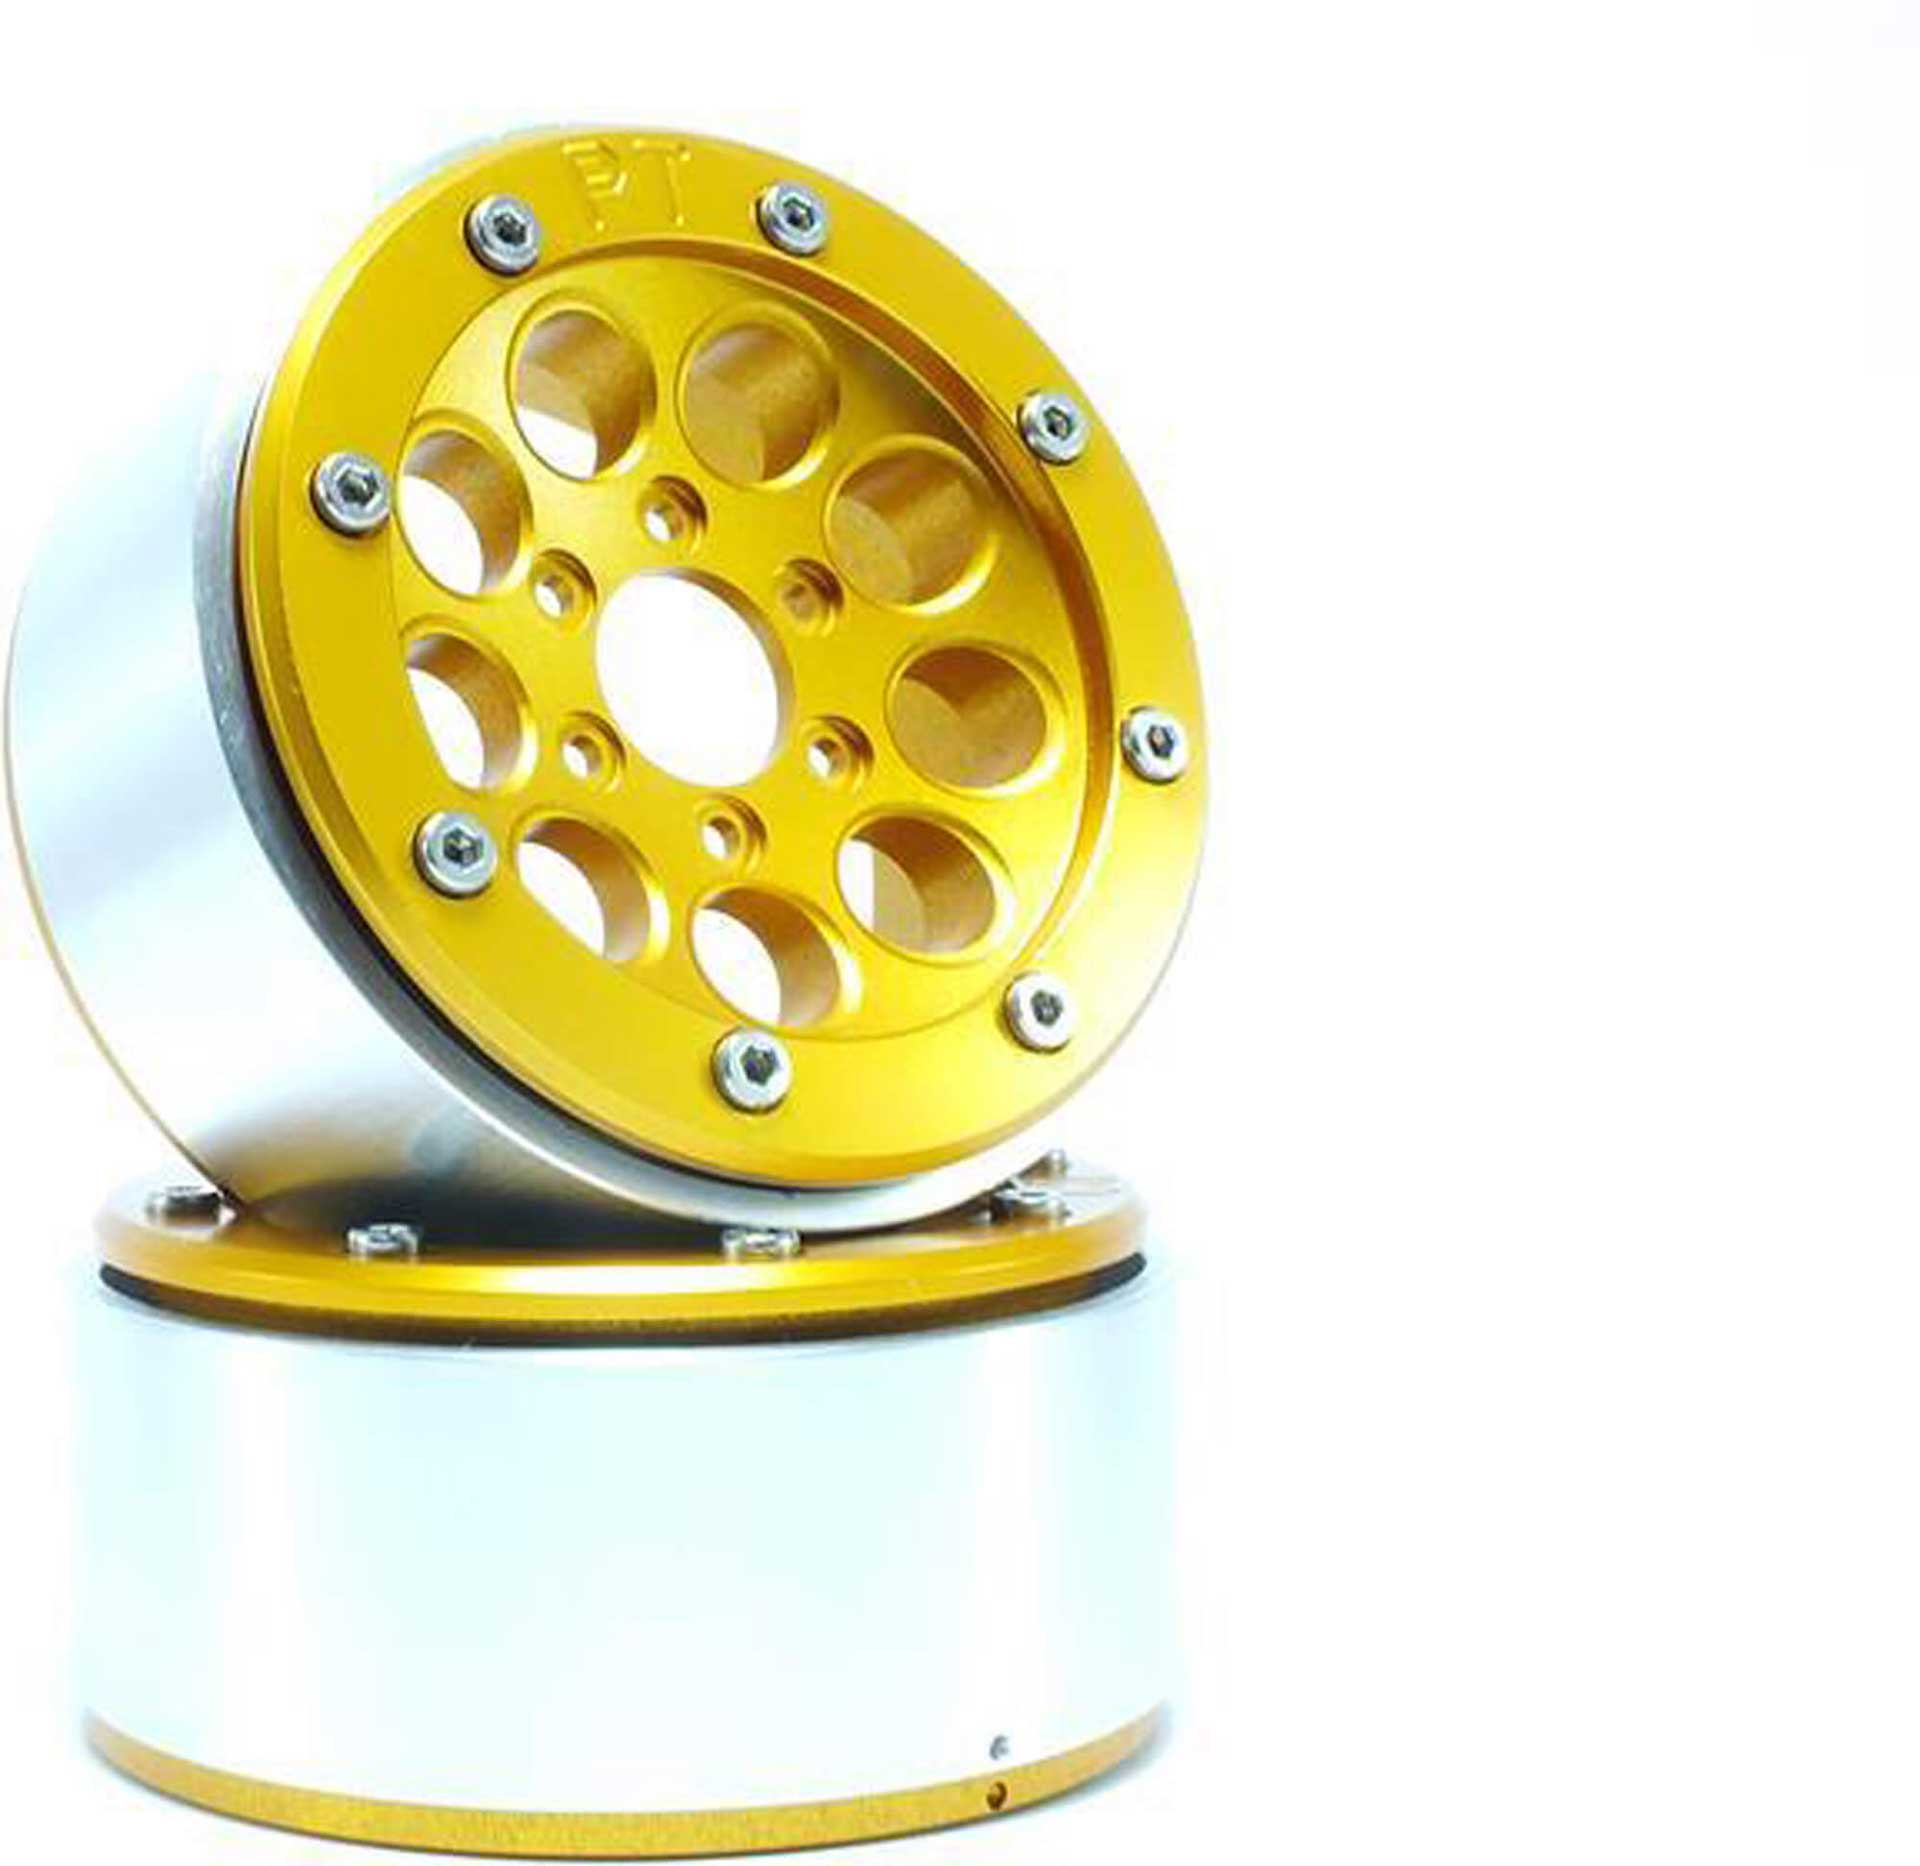 Metsafil Beadlock Wheels GUN gold/gold 1.9 (2 St.) ohne Radnabe